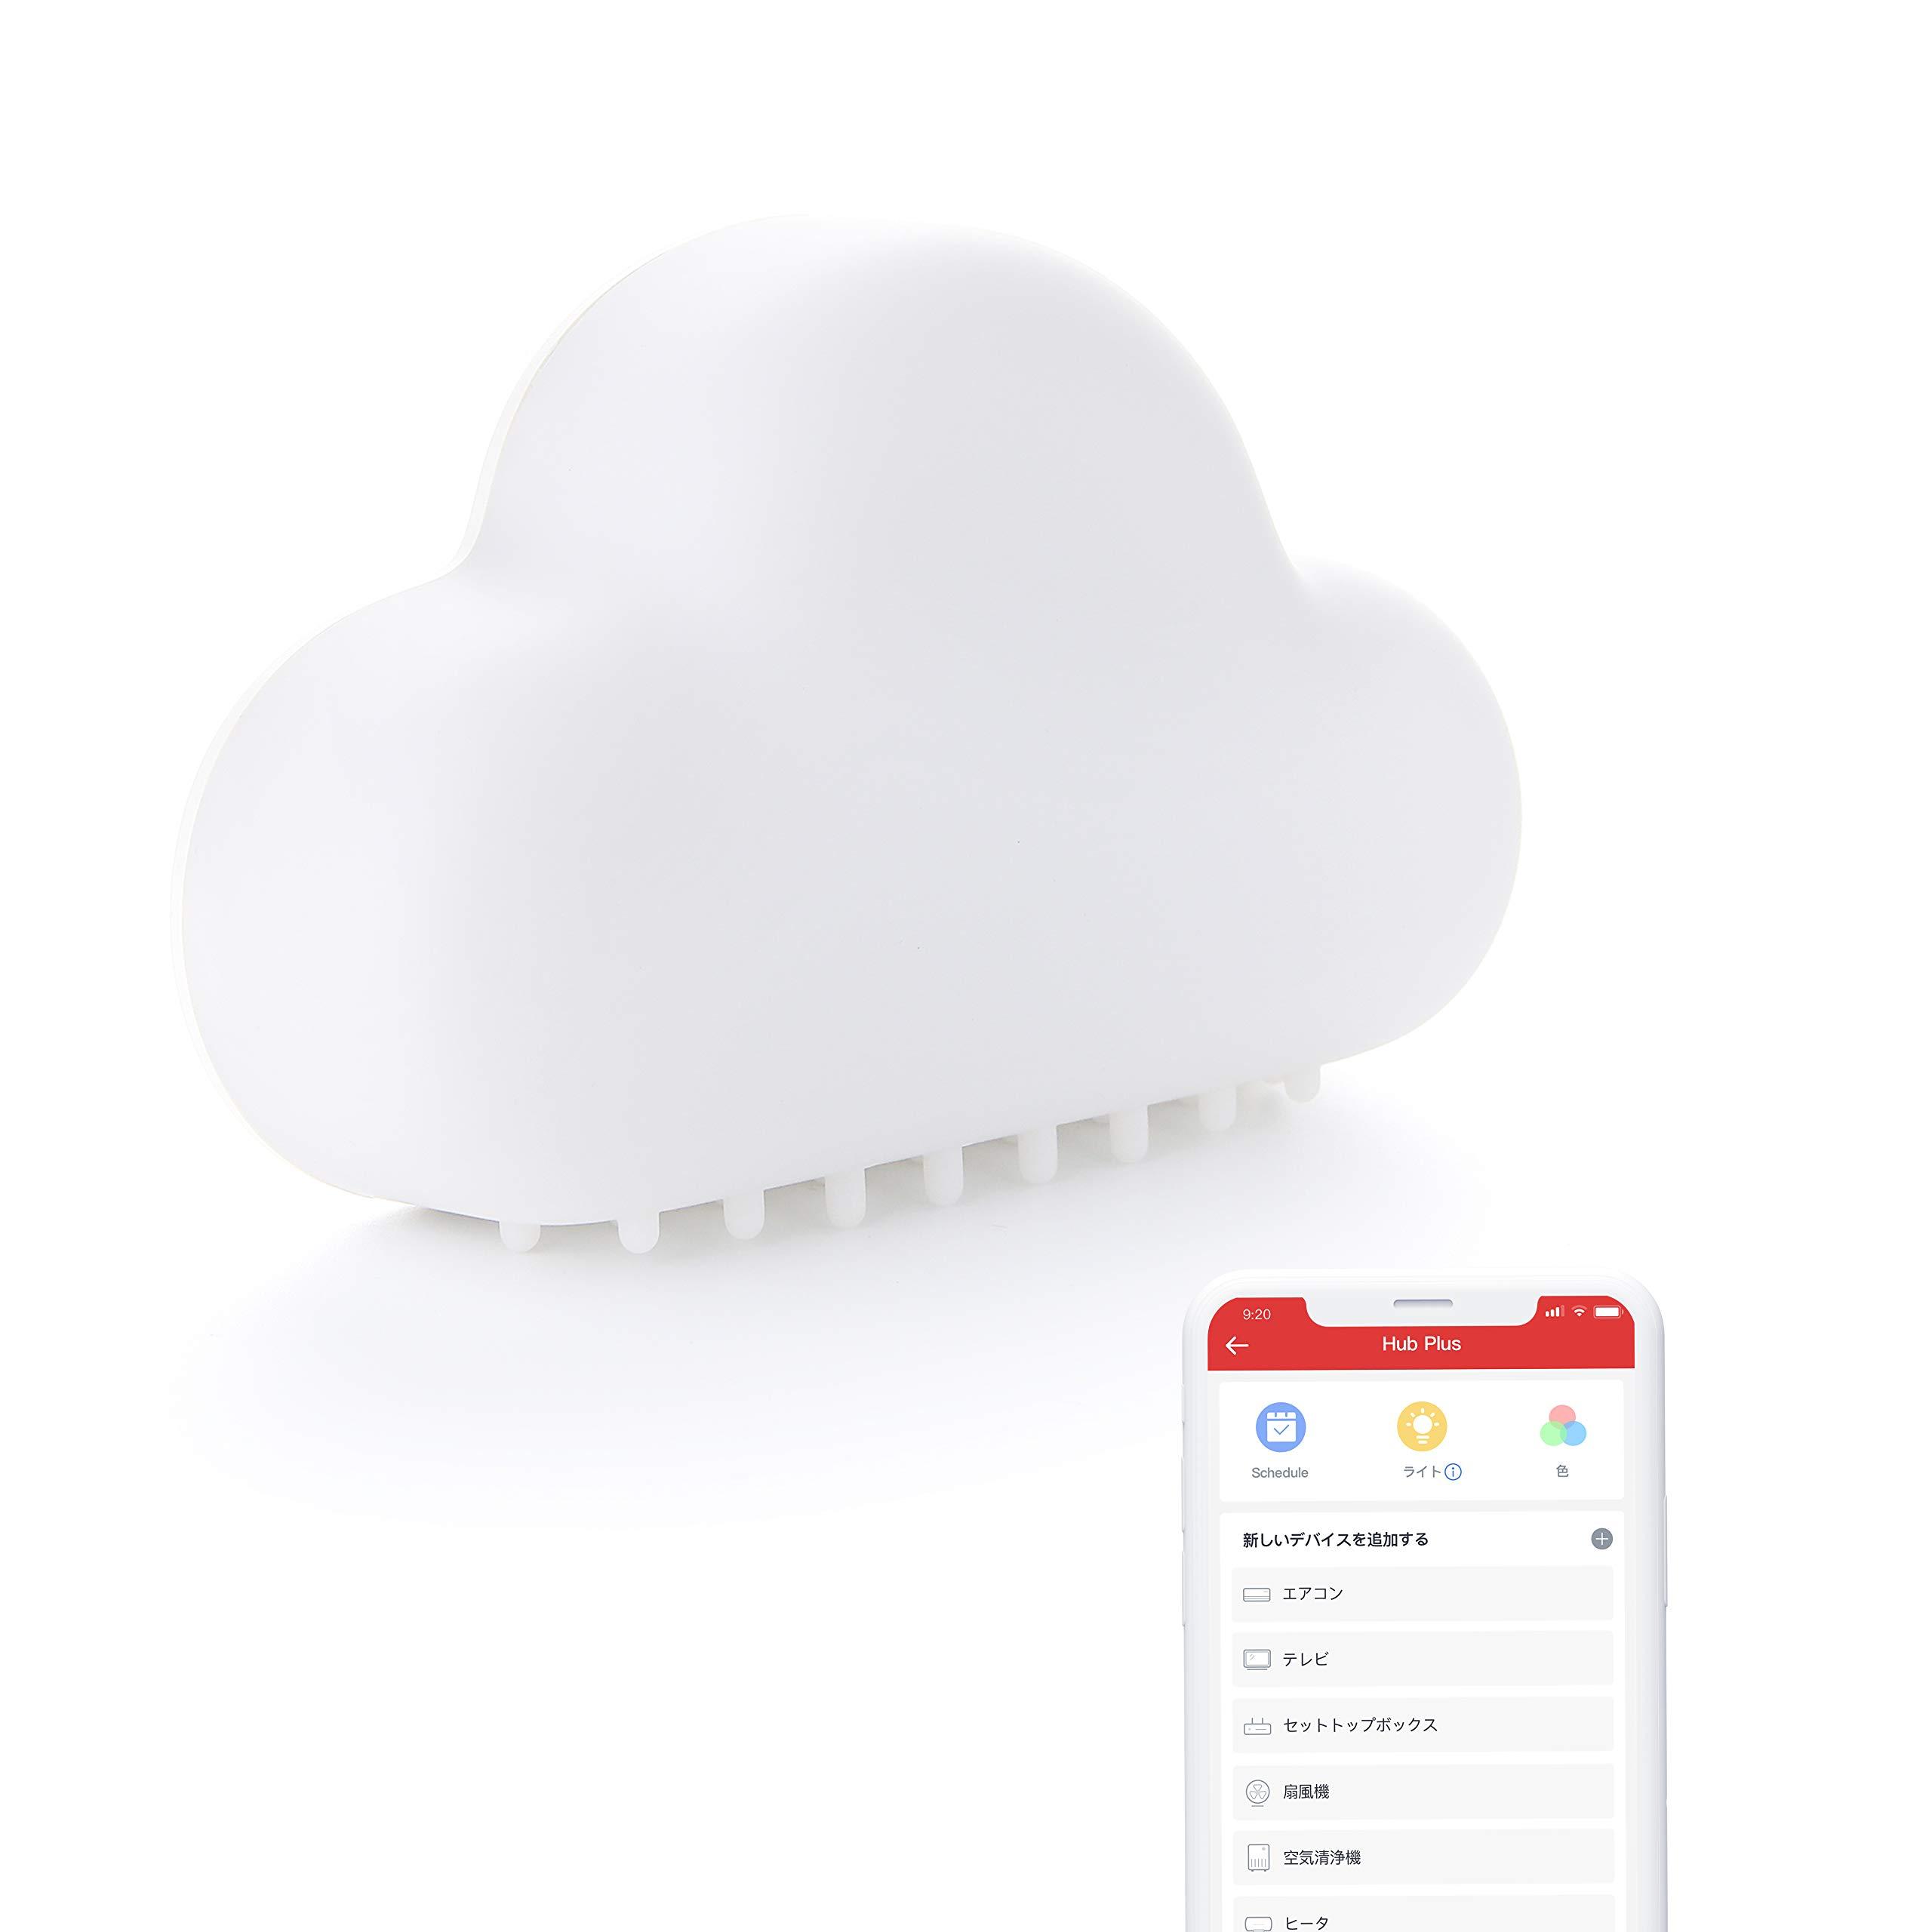 SwitchBot スイッチボット スマートホーム 学習リモコン グーグルホーム Alexa -IFTTT イフト Siriに対応 SwitchBot Hub Plus (Hub Plus) product image